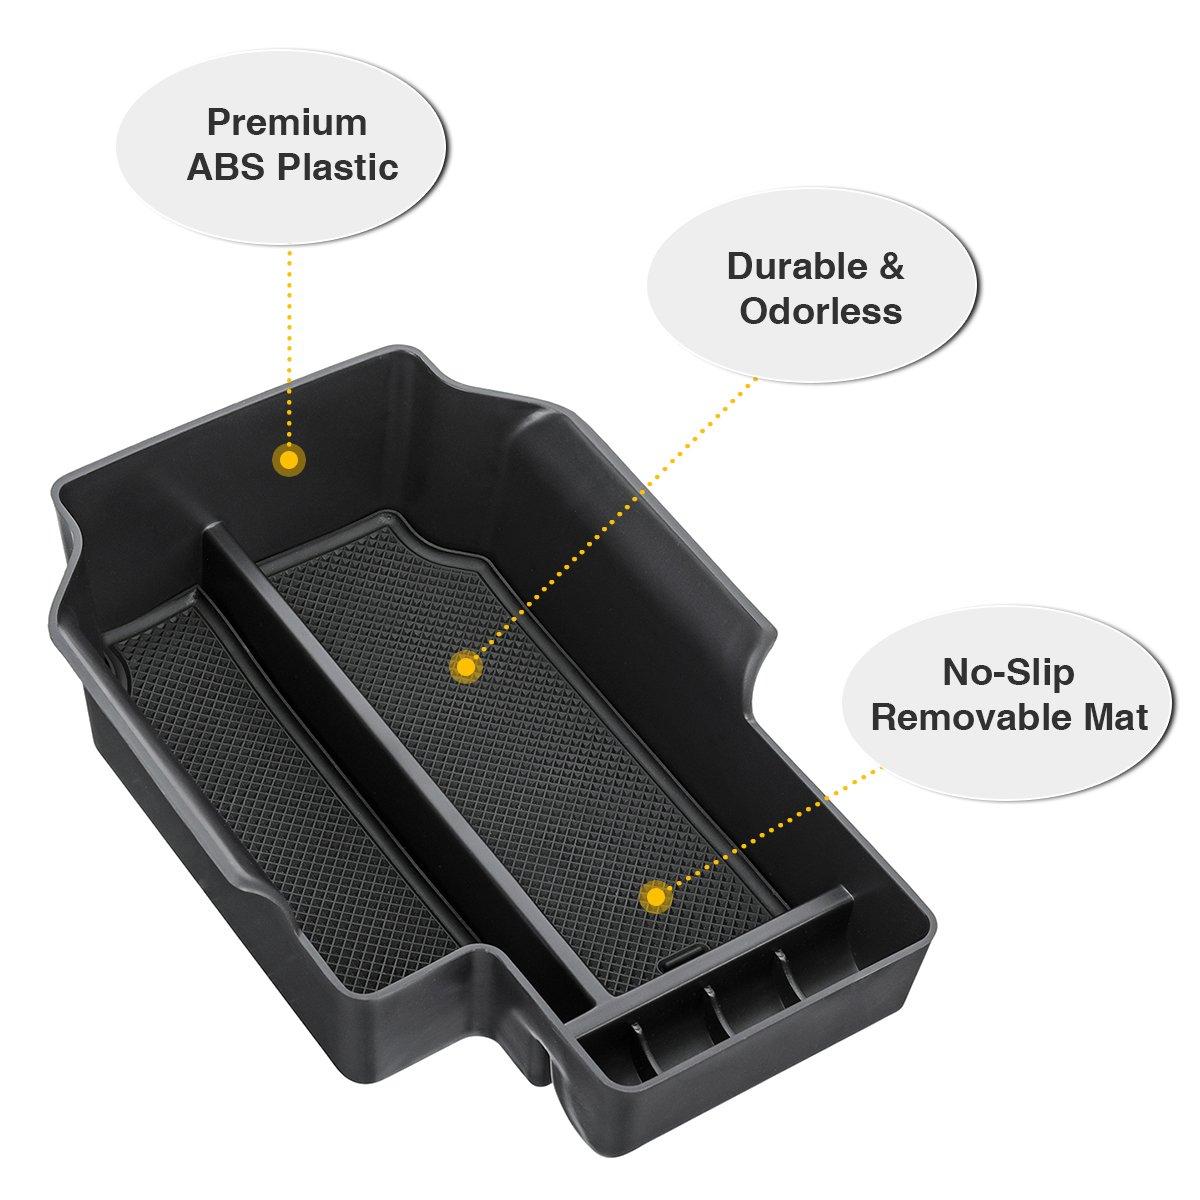 Audew Car Center Console Organizer Tray for Center Chevy Colorado GMC Canyon 2015-2018 Accessories Central Armrest Box Compartment